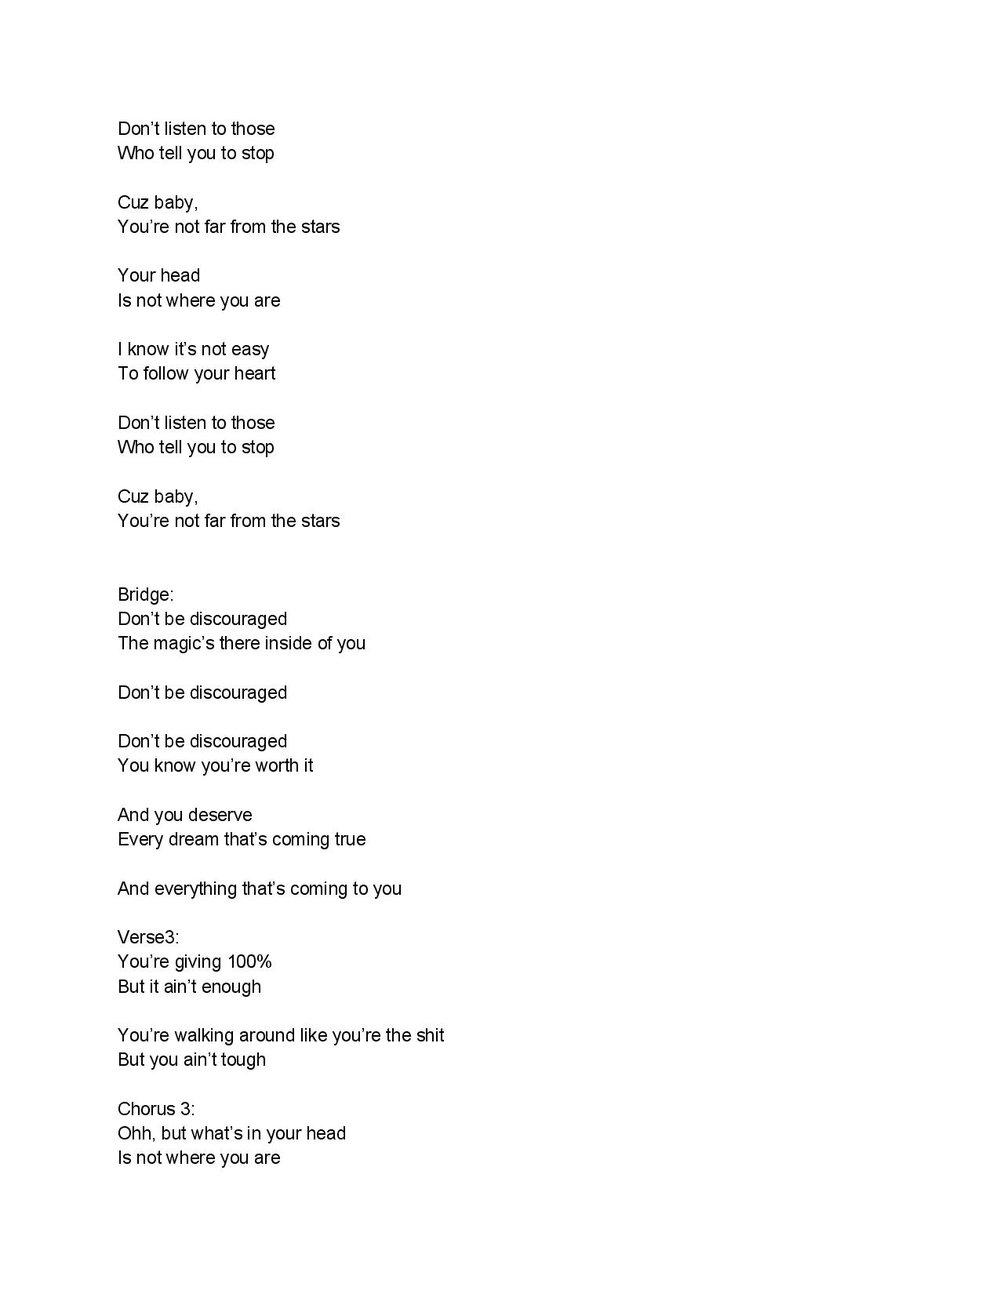 Lyrics100-page-002.jpg